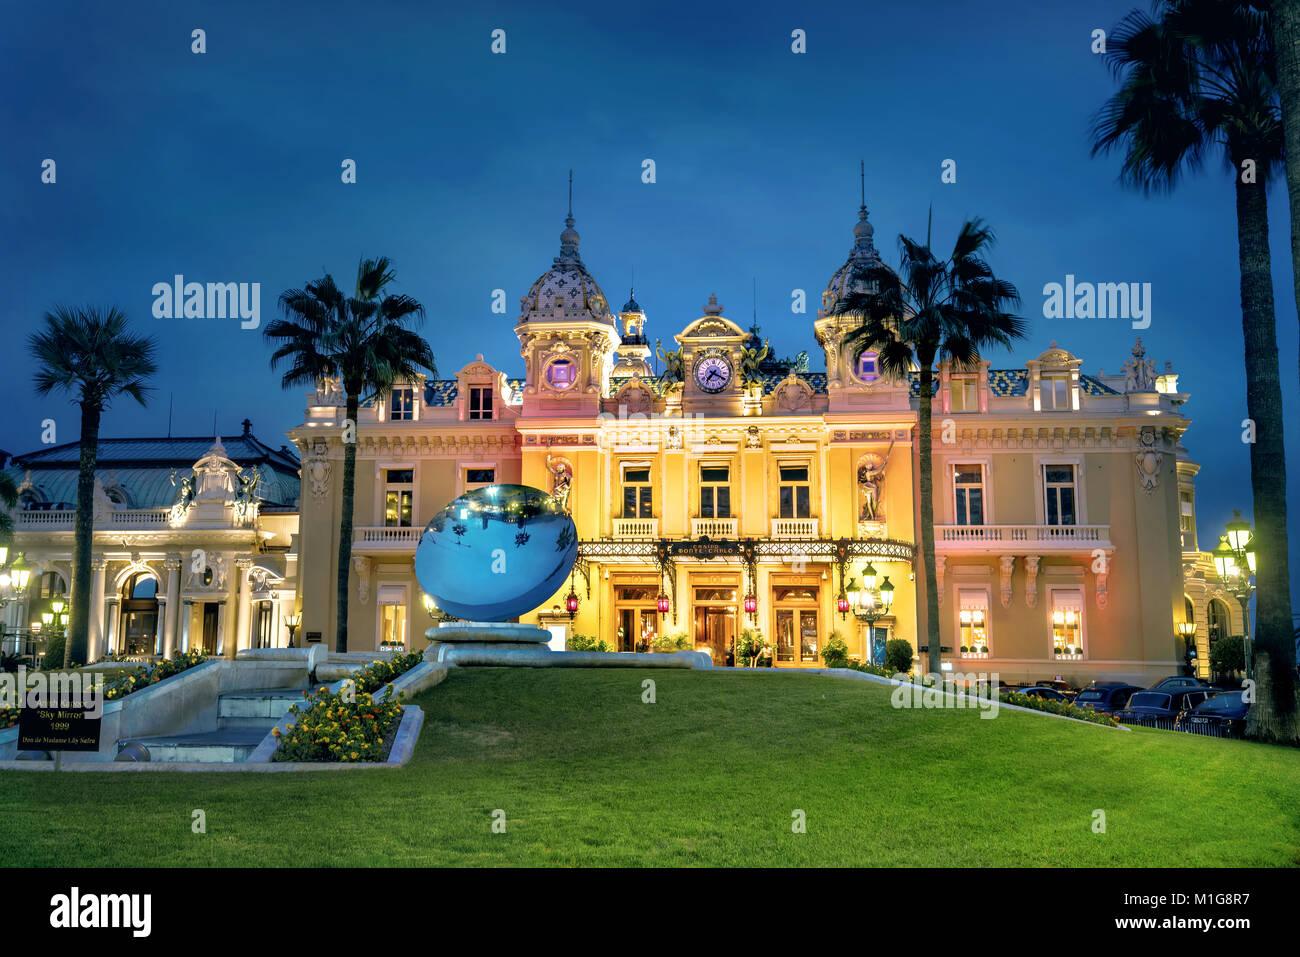 foto kasino europe krasnodar